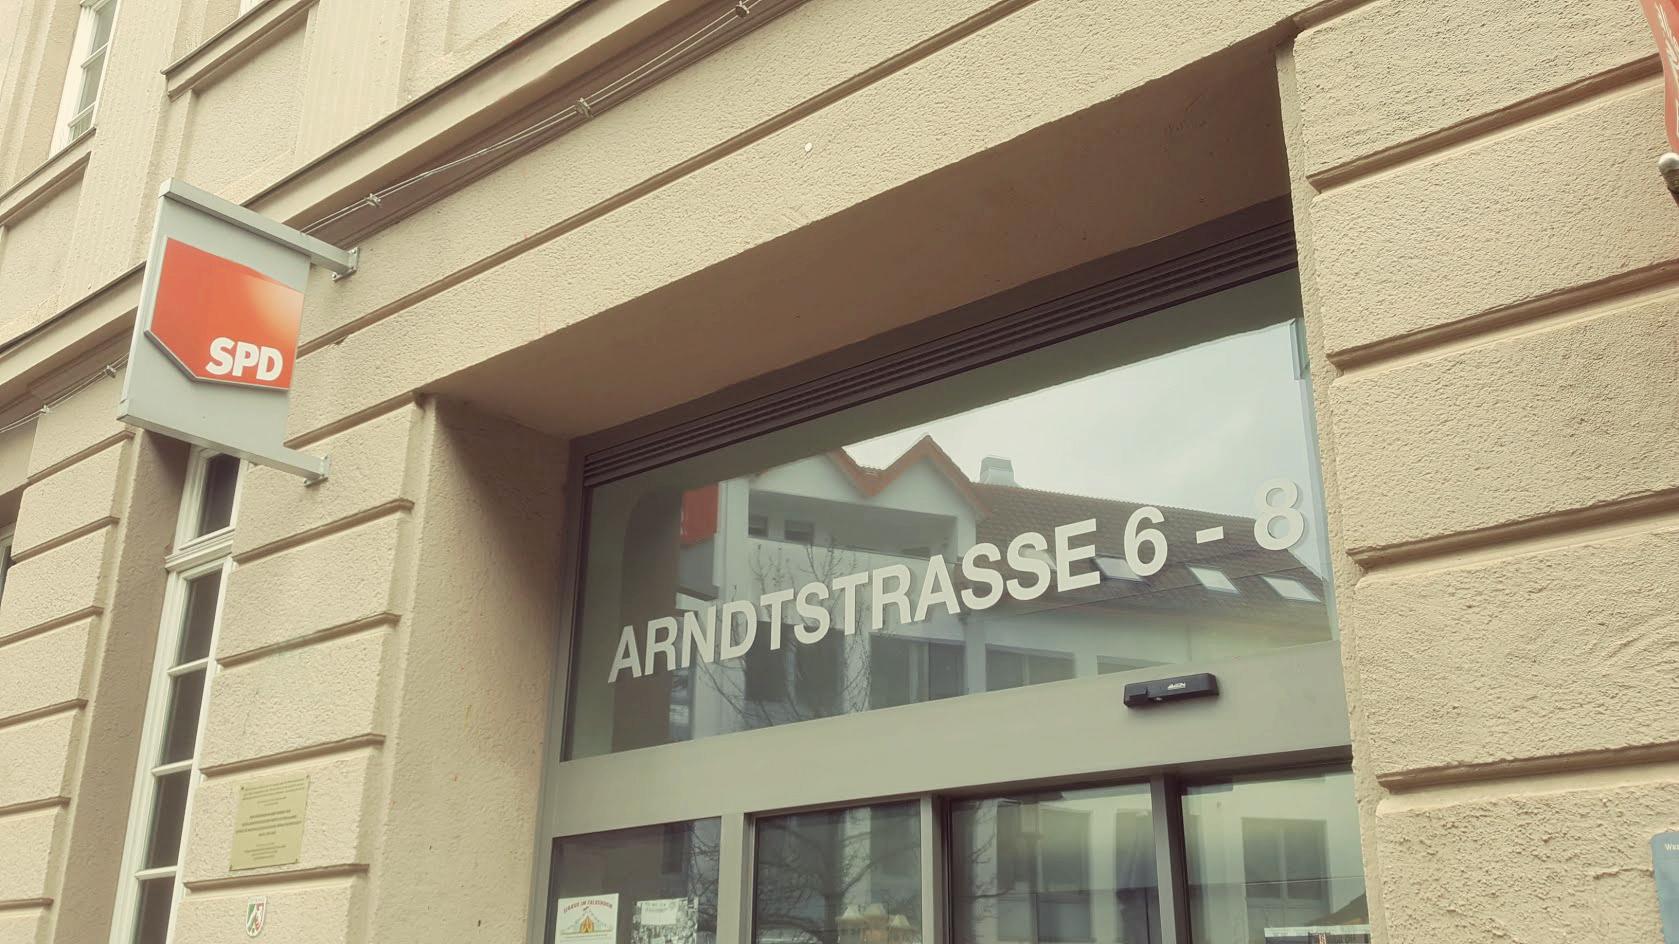 SPD Eingang.jpg